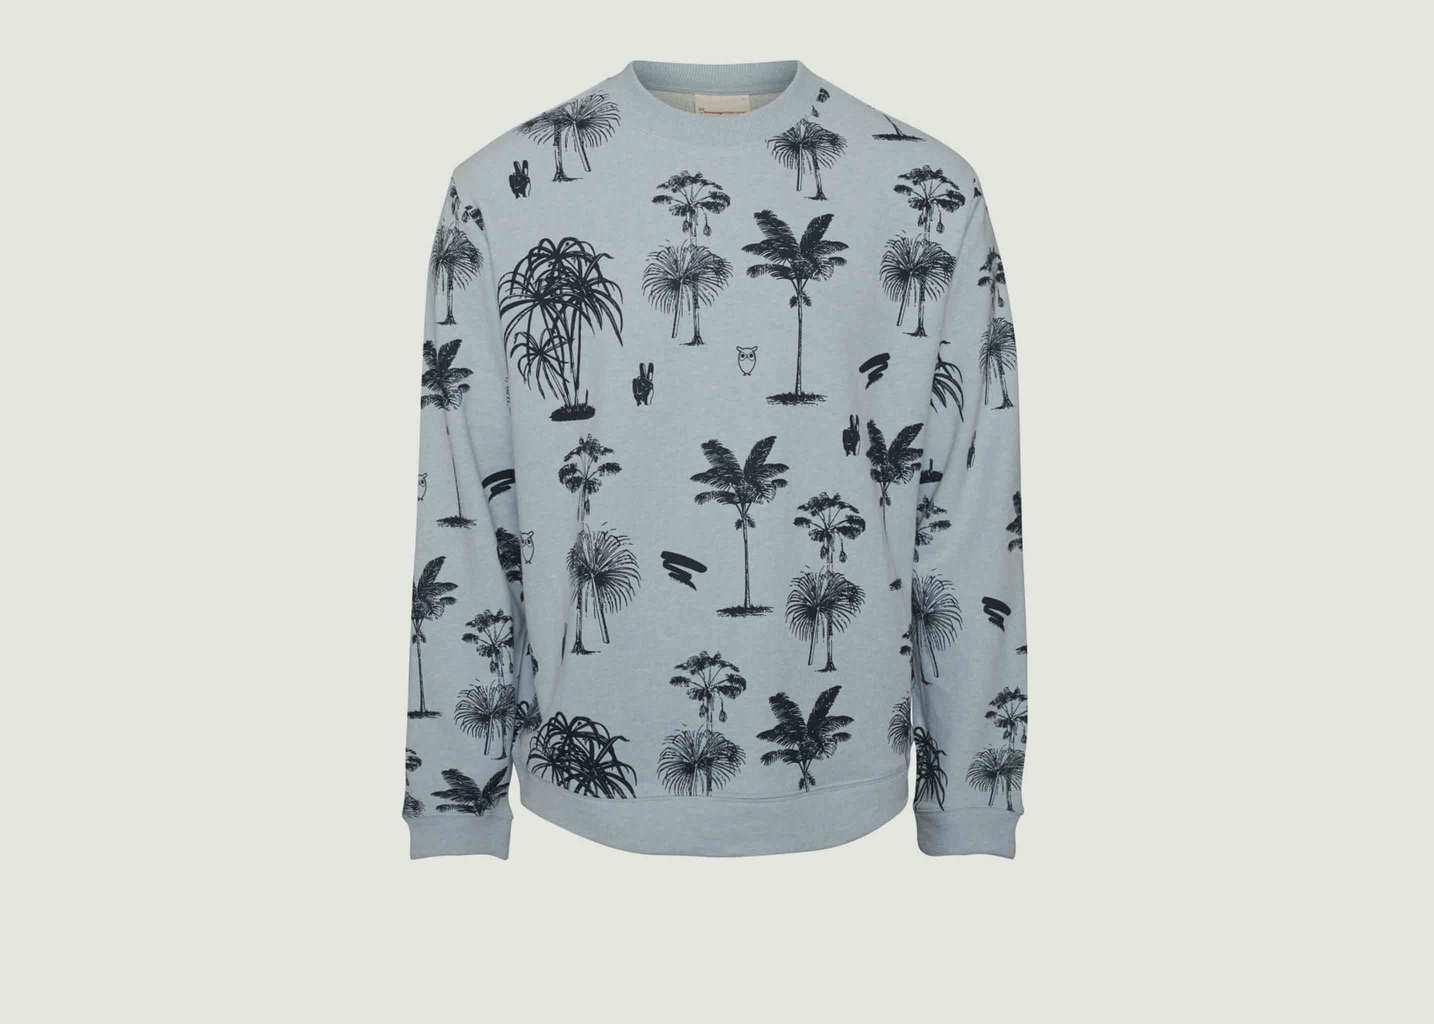 Sweat Big Palms - Knowledge Cotton Apparel